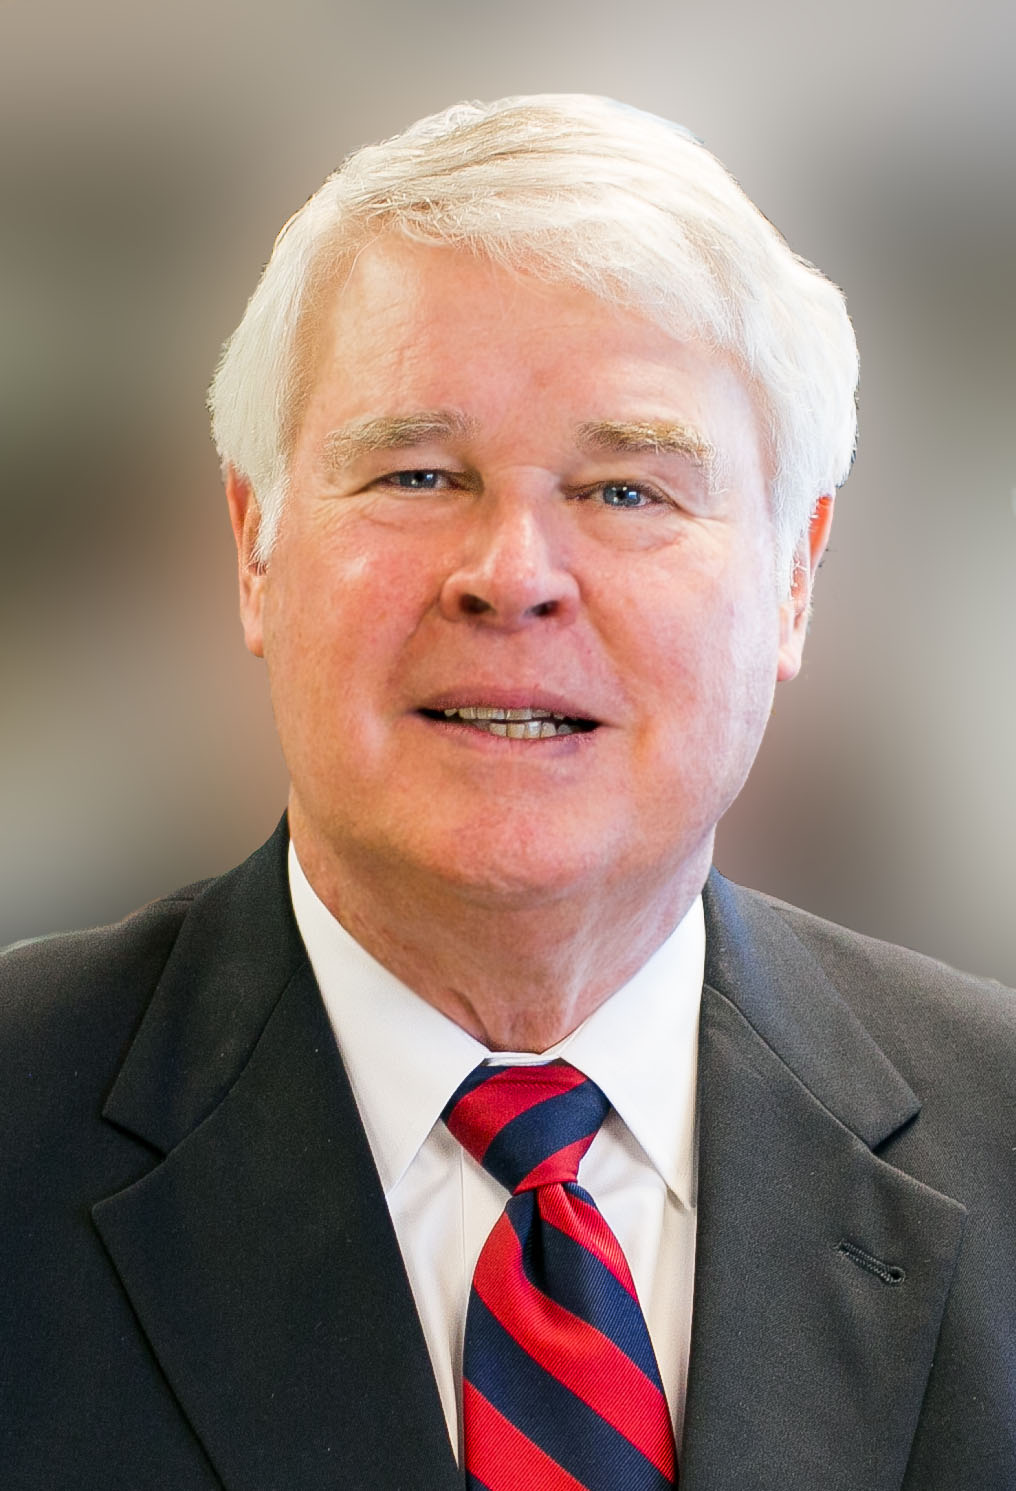 Image of Donald P. (Pat) Moloney II